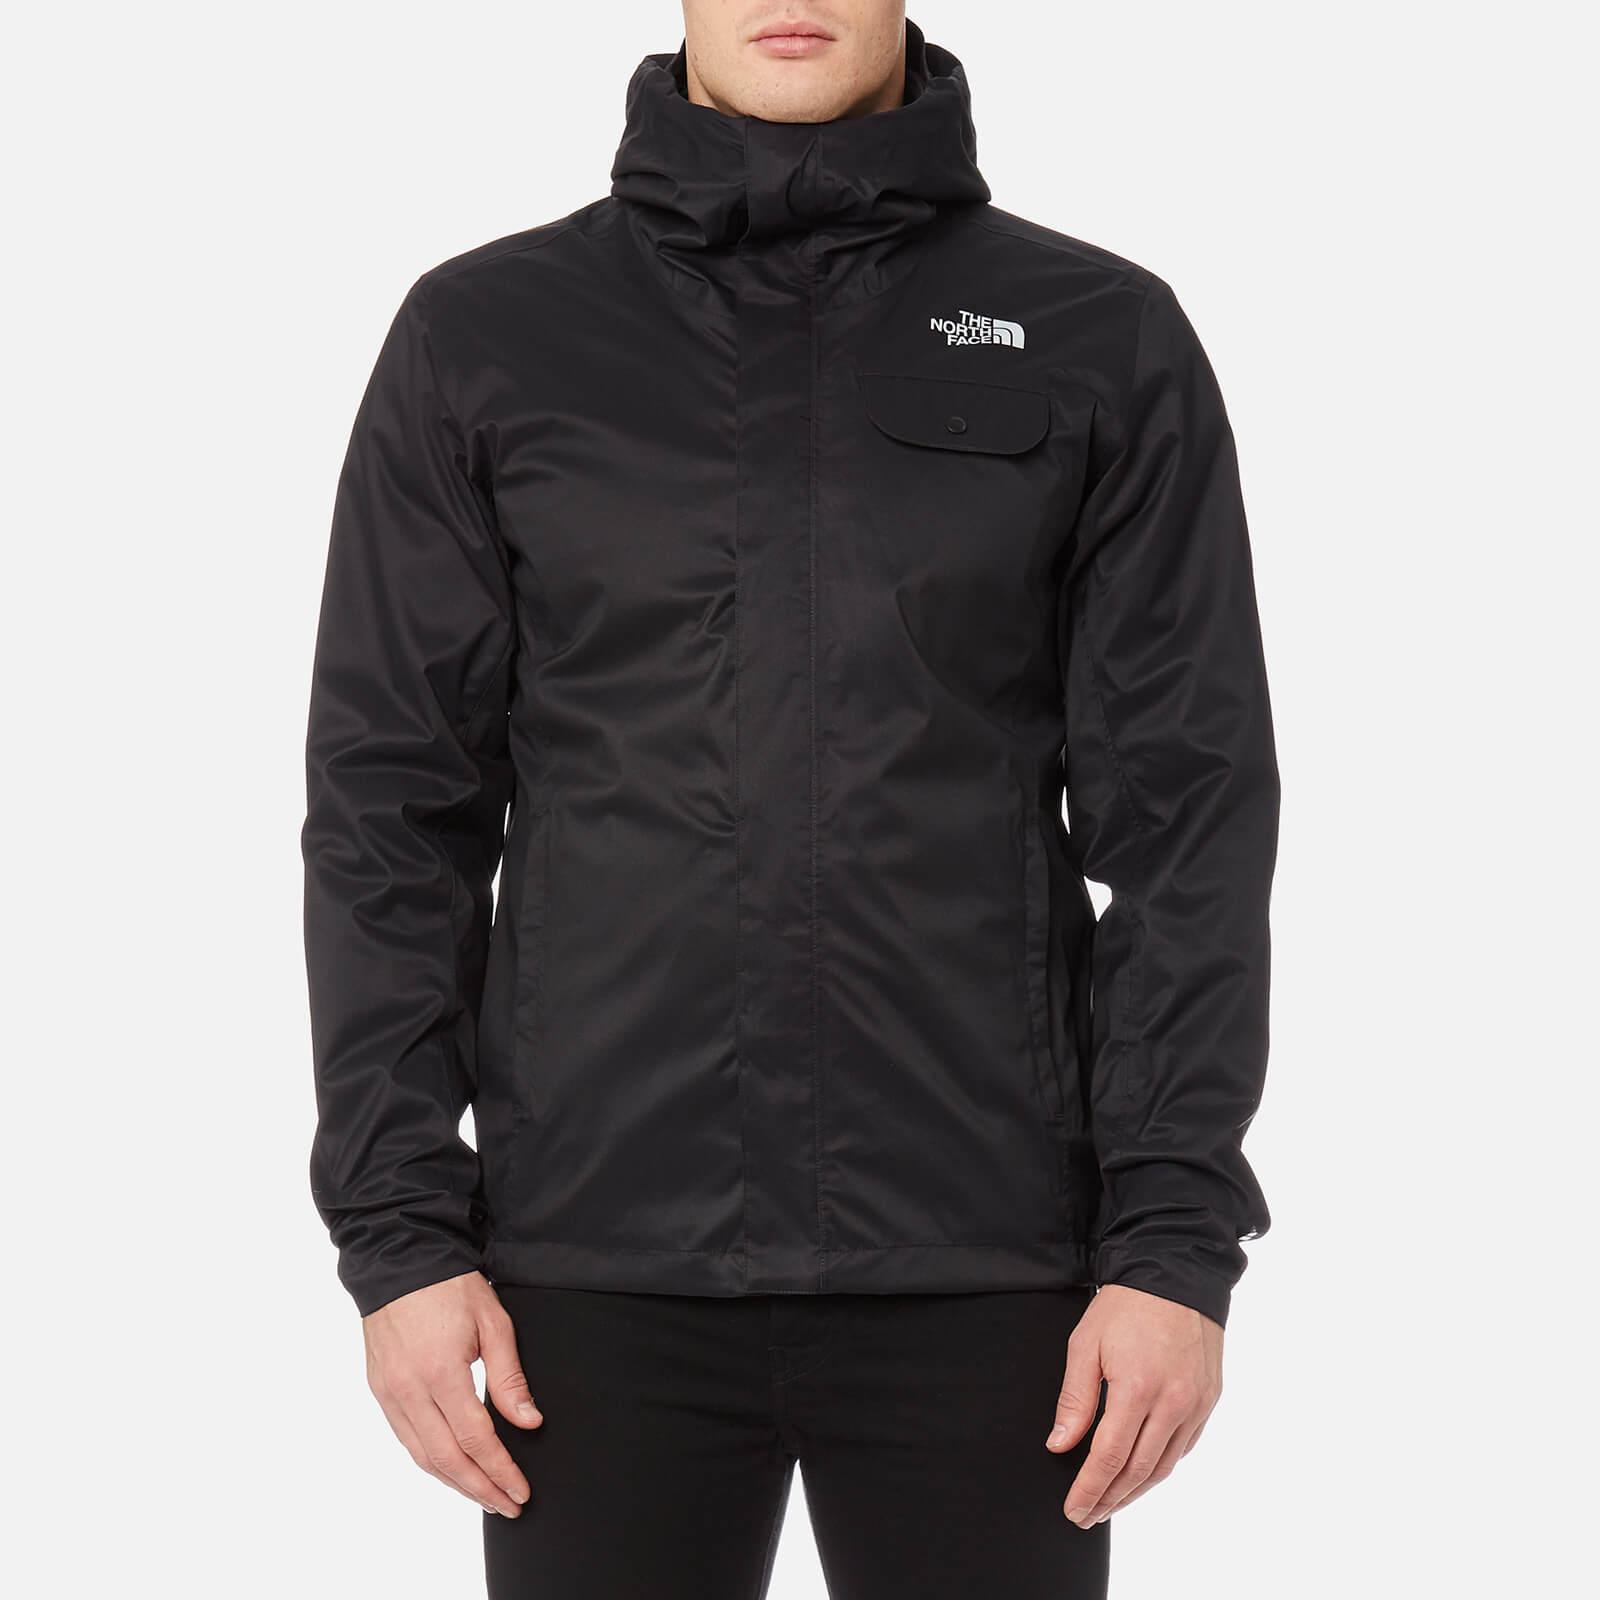 produkty wysokiej jakości najlepsze trampki jakość The North Face Men's Tanken Triclimate® Jacket - TNF Black